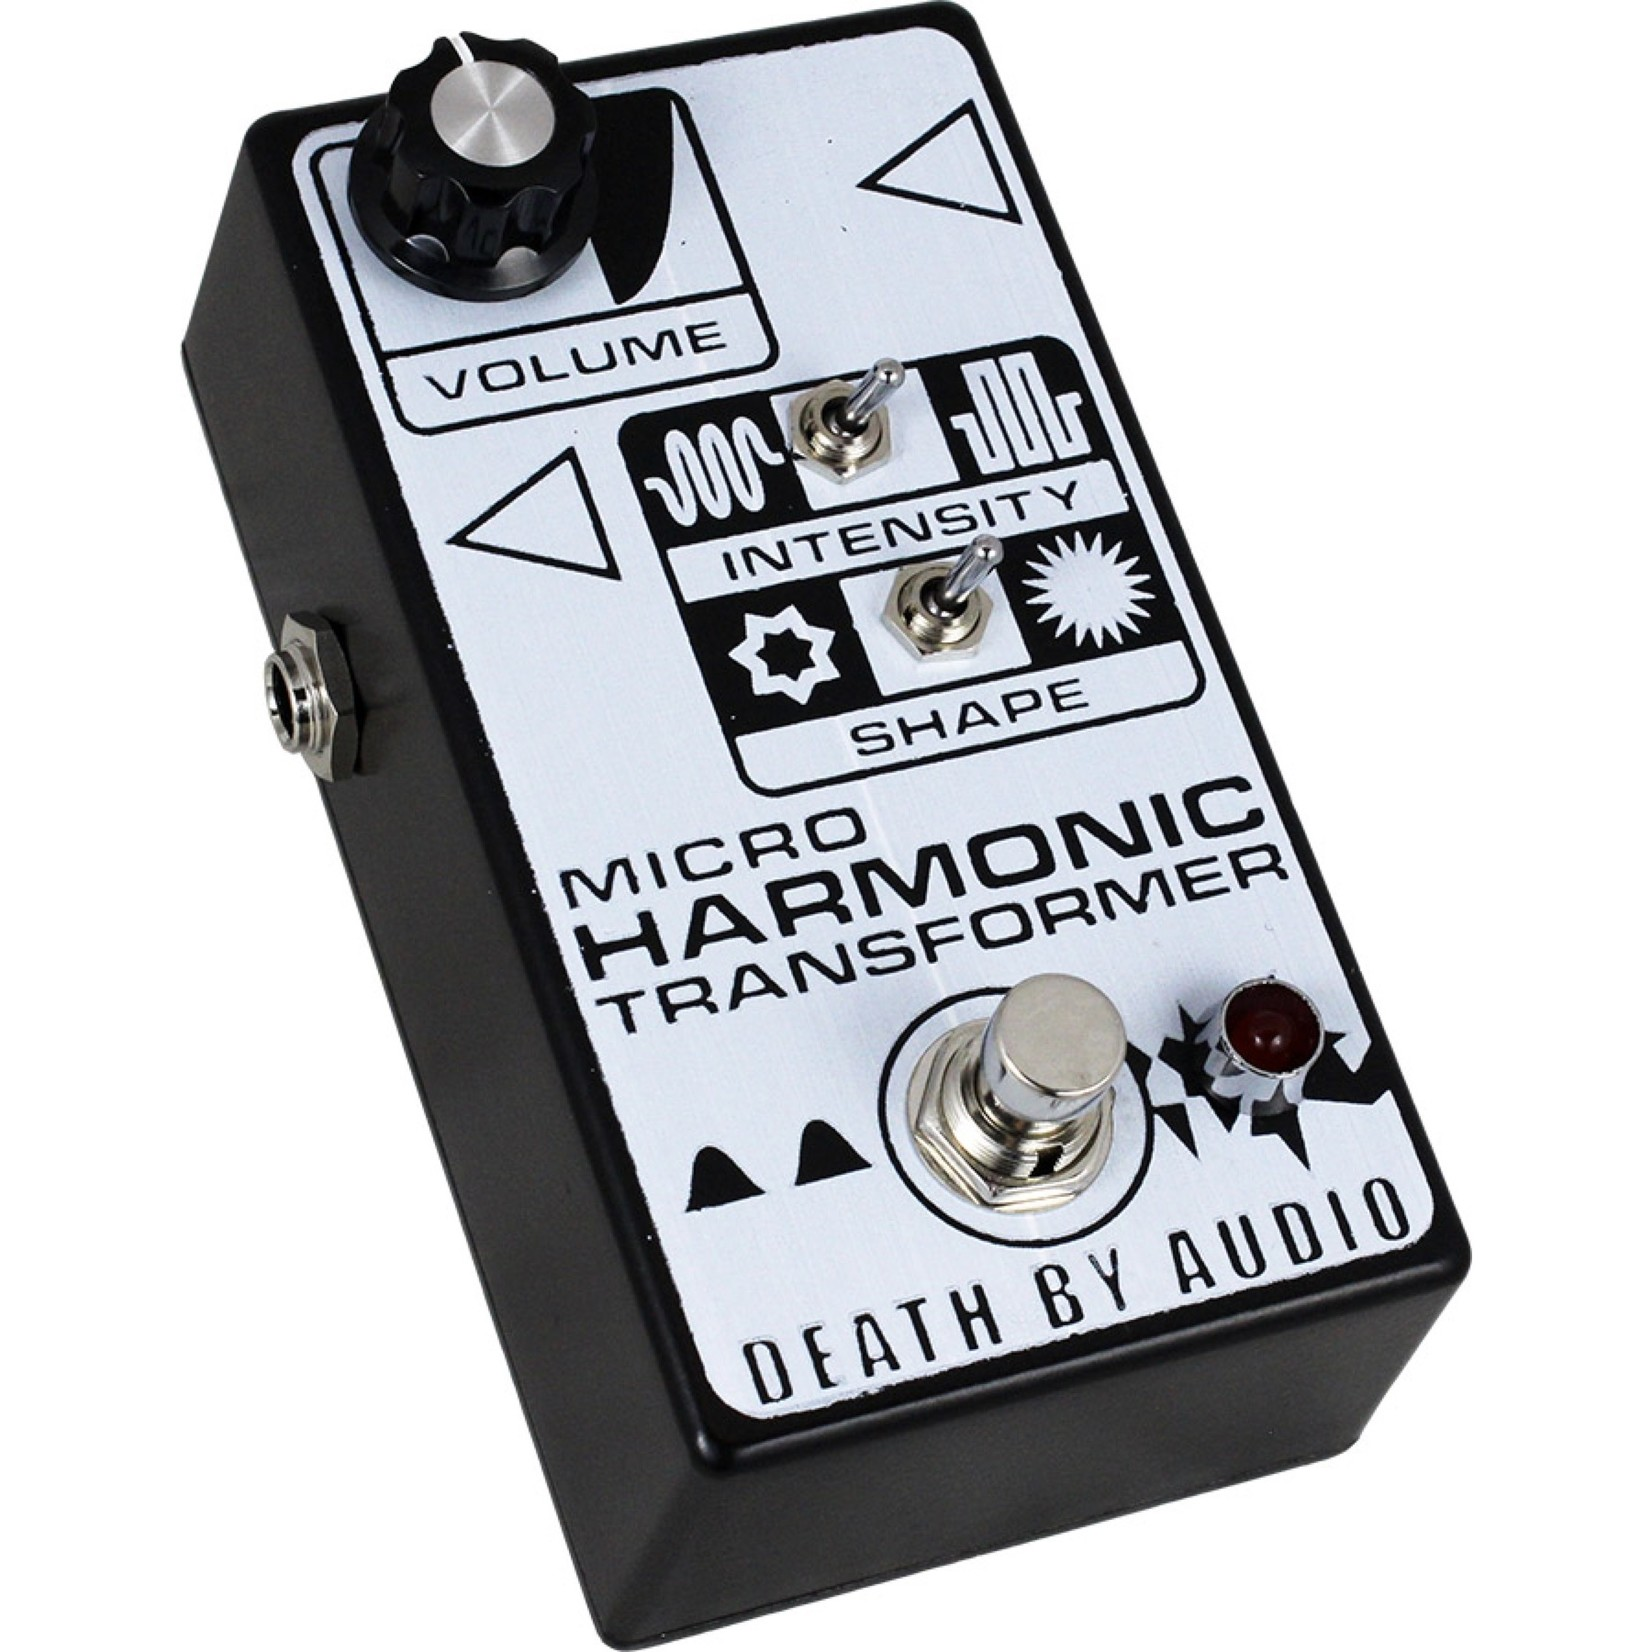 Death By Audio Death By Audio Micro Harmonic Transformer Fuzz